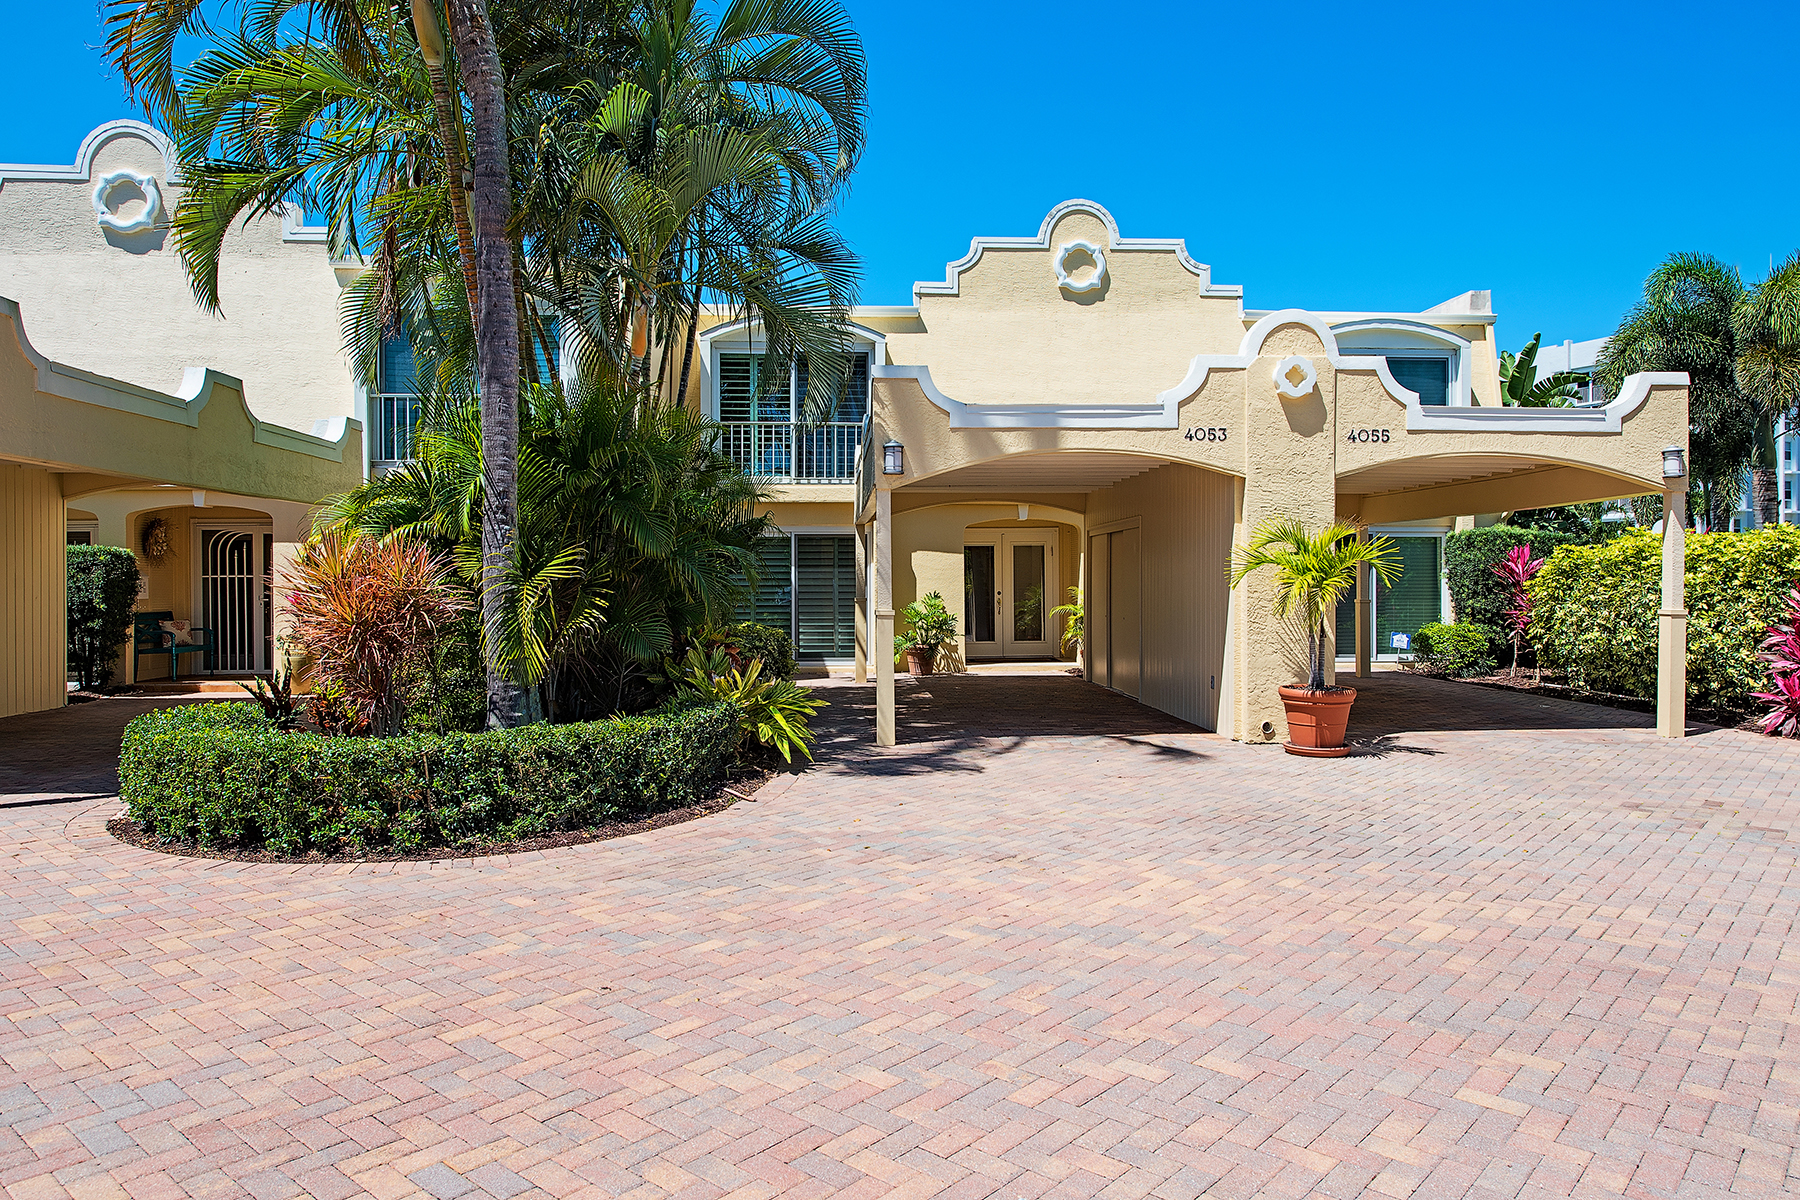 Residência urbana para Venda às PARK SHORE - COLONY GARDENS 4053 Crayton Rd 4O53 Naples, Florida, 34103 Estados Unidos